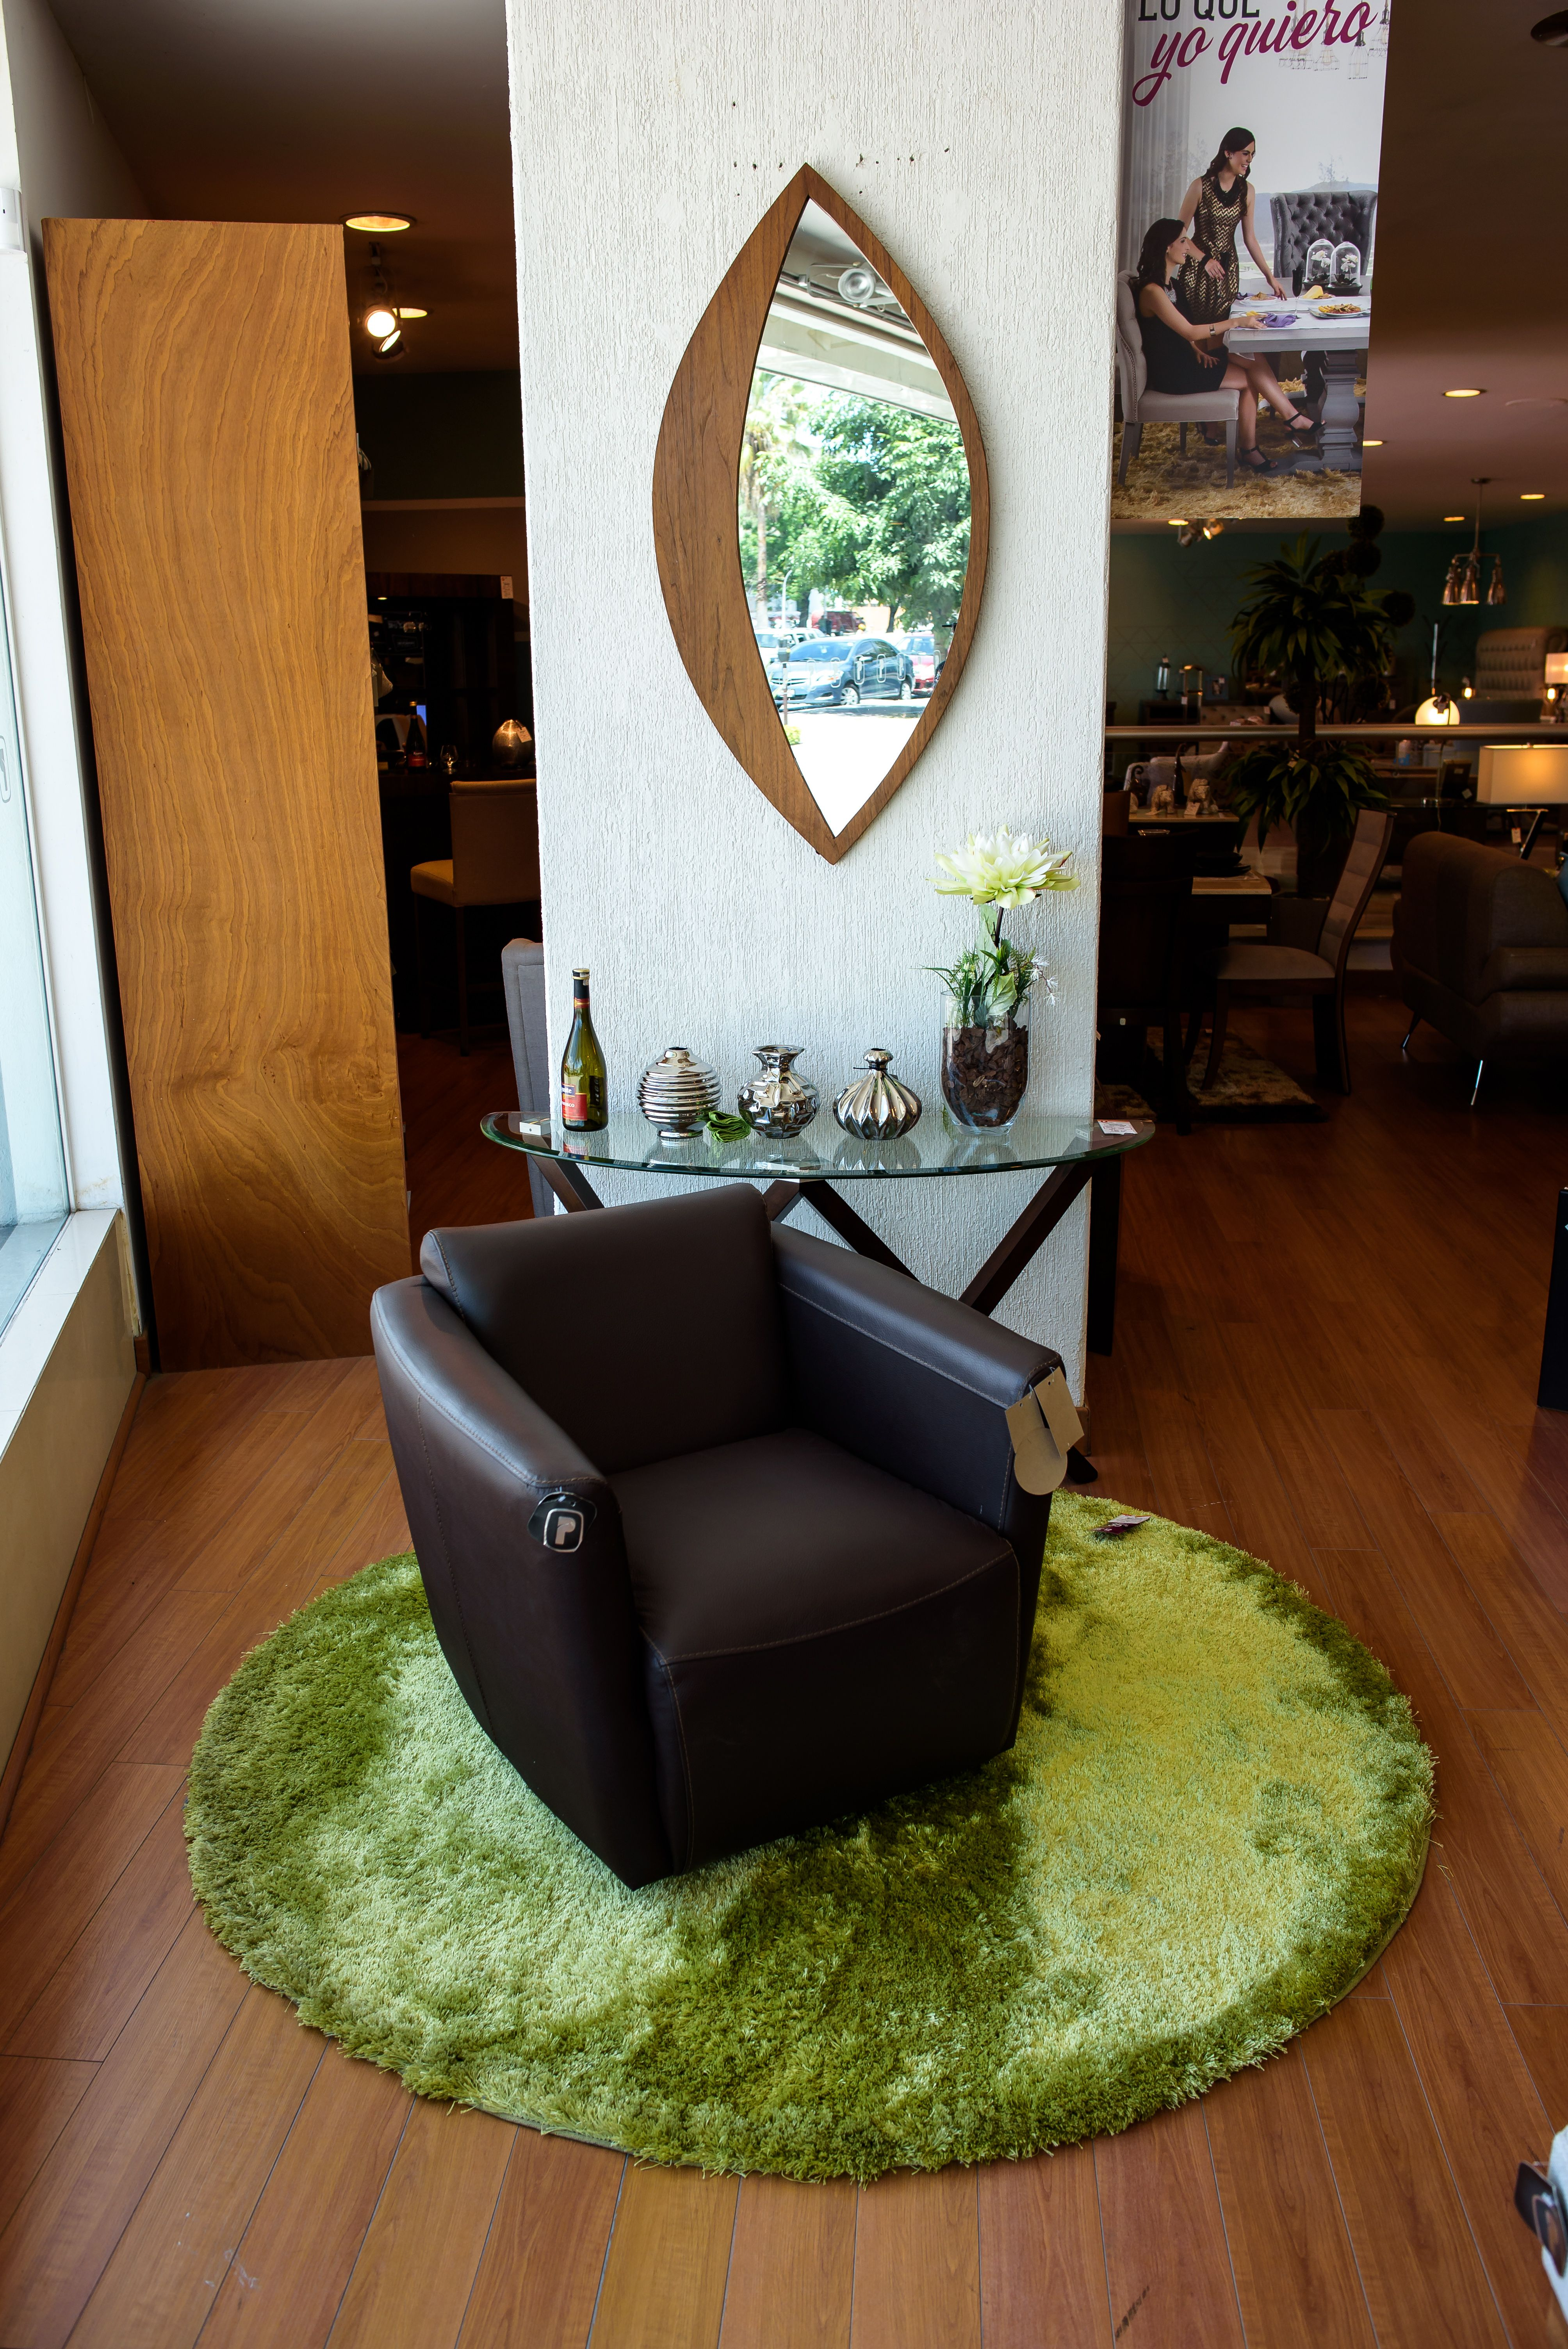 Pin De Placencia Muebles En Sillones Ocasionales Pinterest  # Muebles Reclinables Santo Domingo